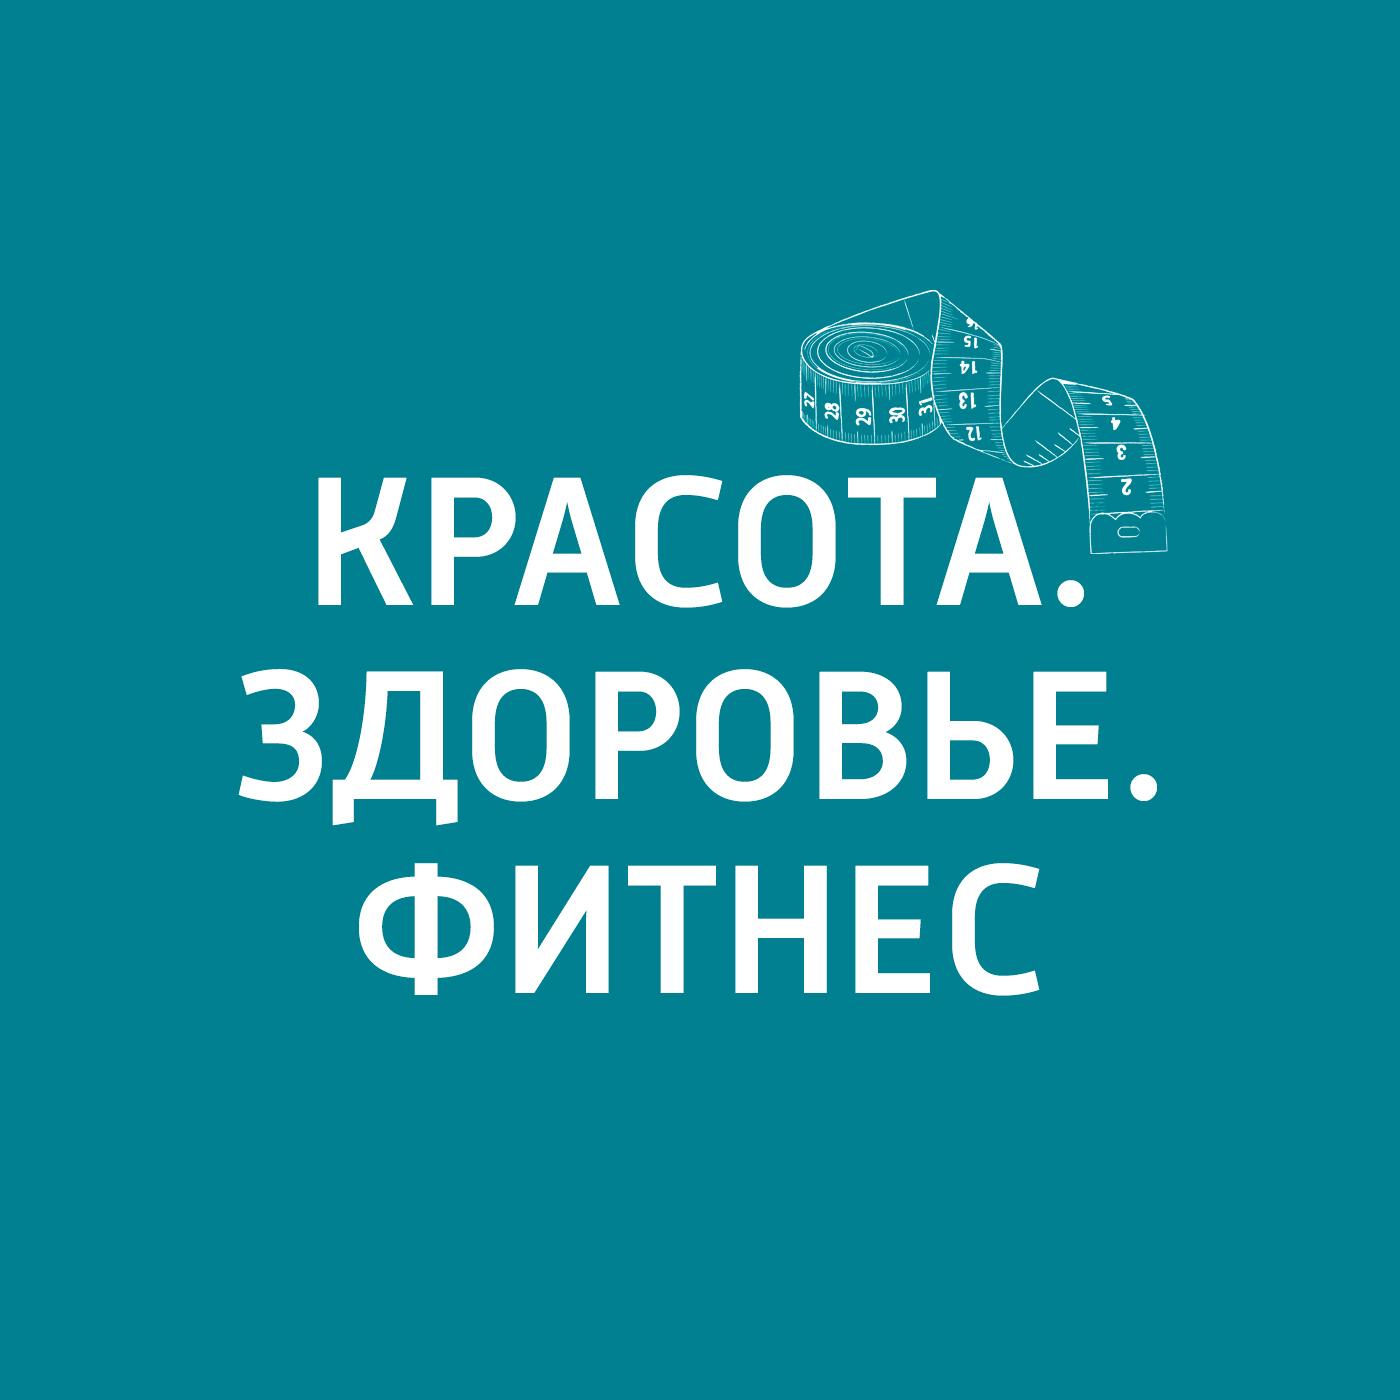 Маргарита Митрофанова Косметика для детей детская косметика кроха в челябинске